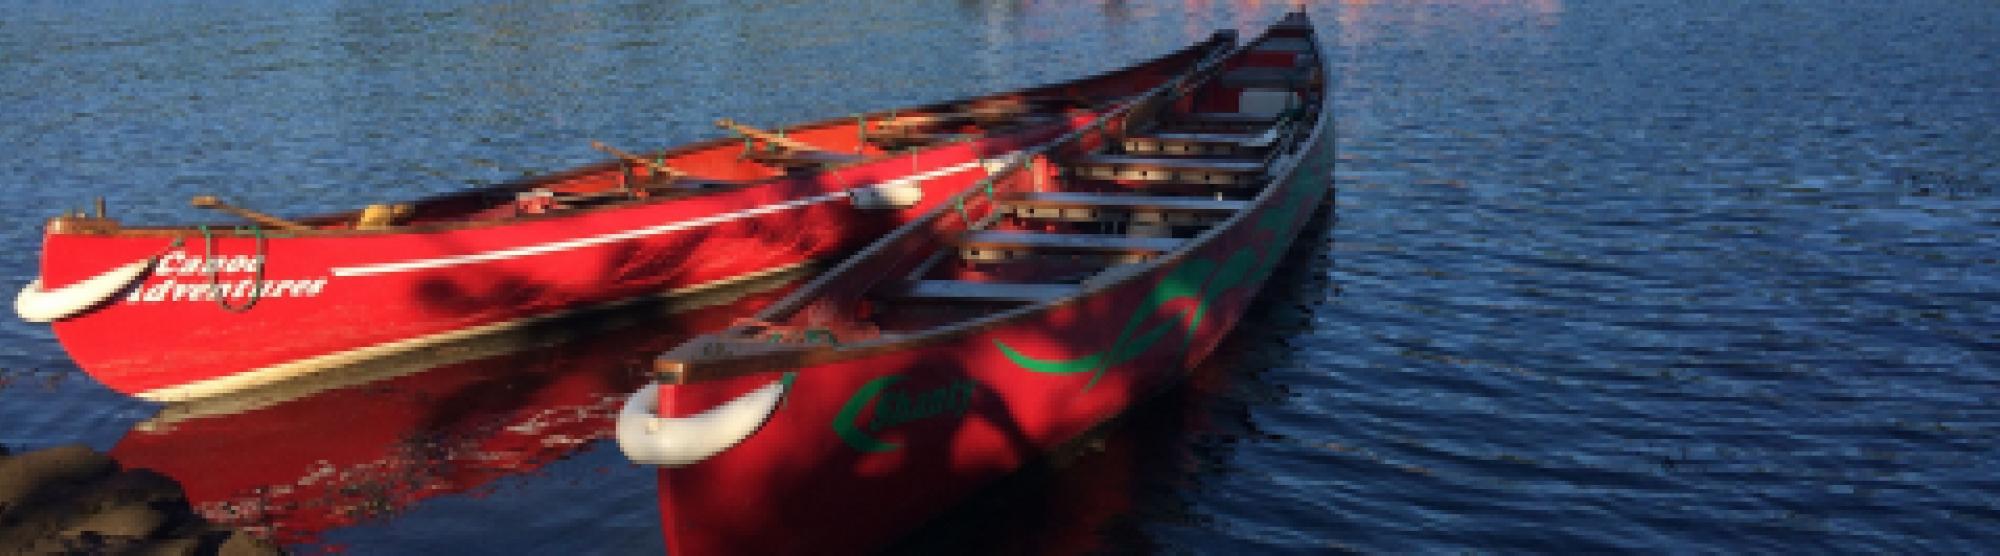 big canoes with Canoe Adventures